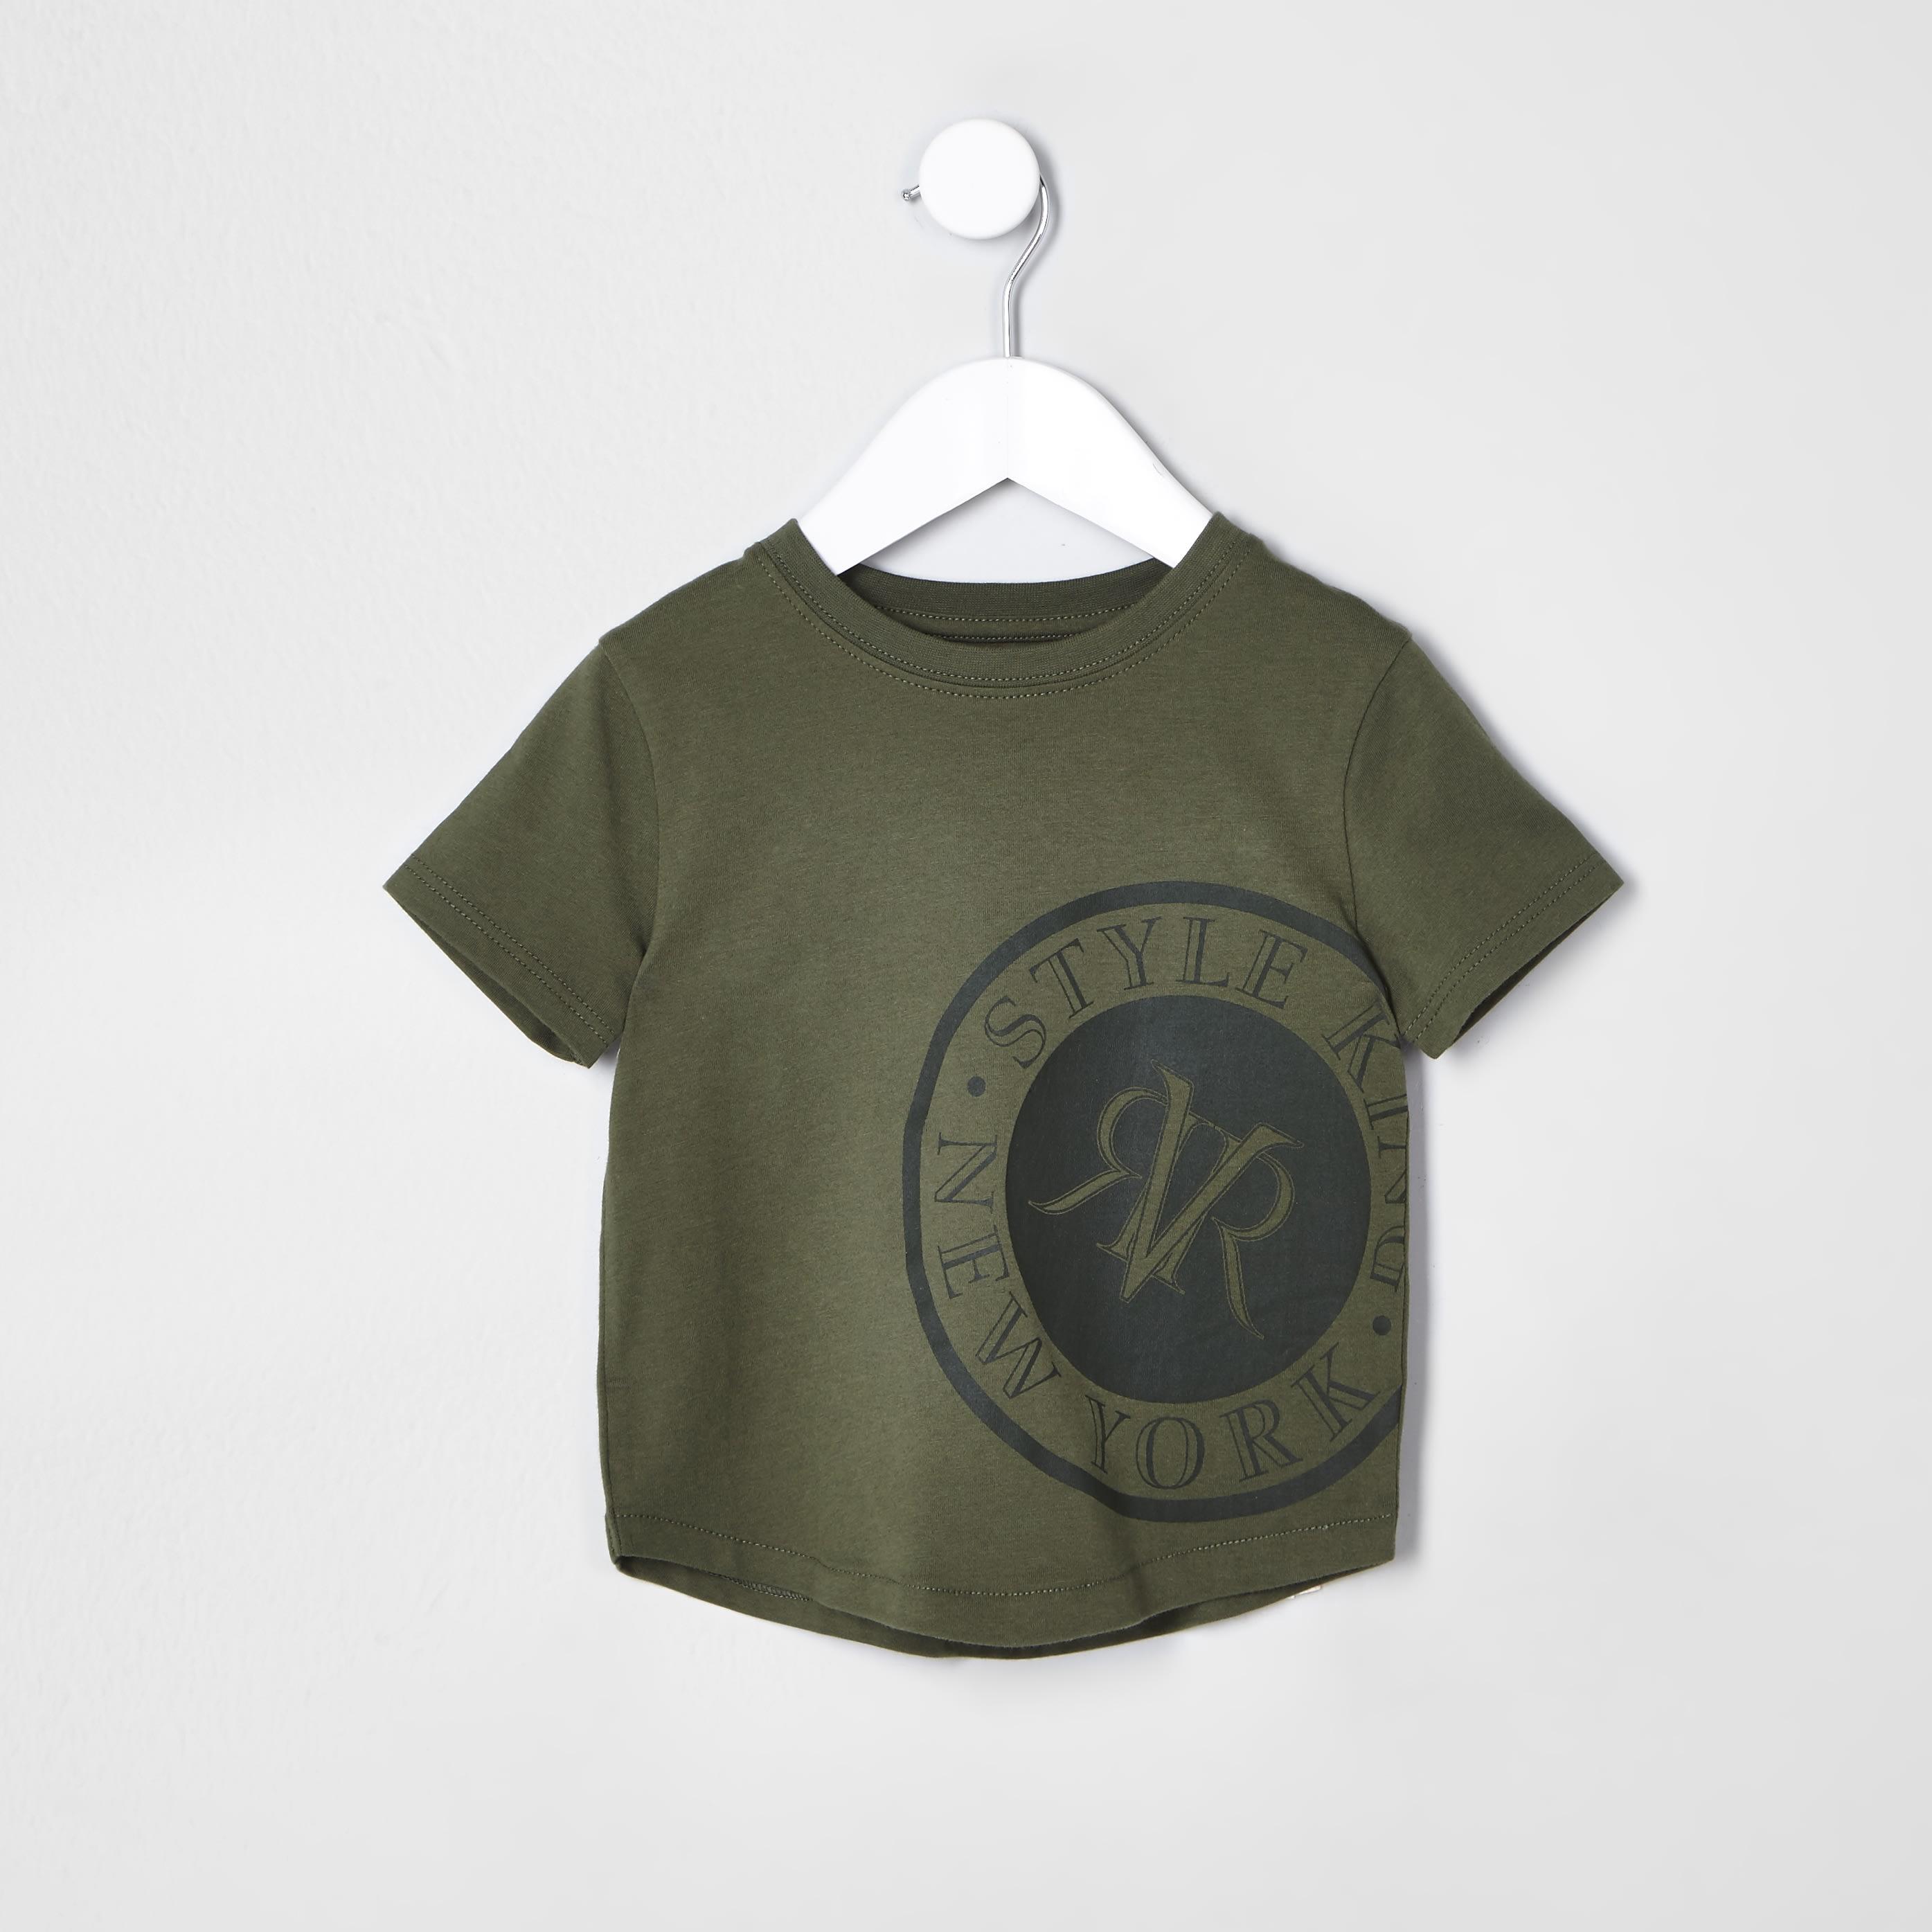 River Island Mens Baby Boys Khaki 'New York' T-shirt (0-3 Mths)